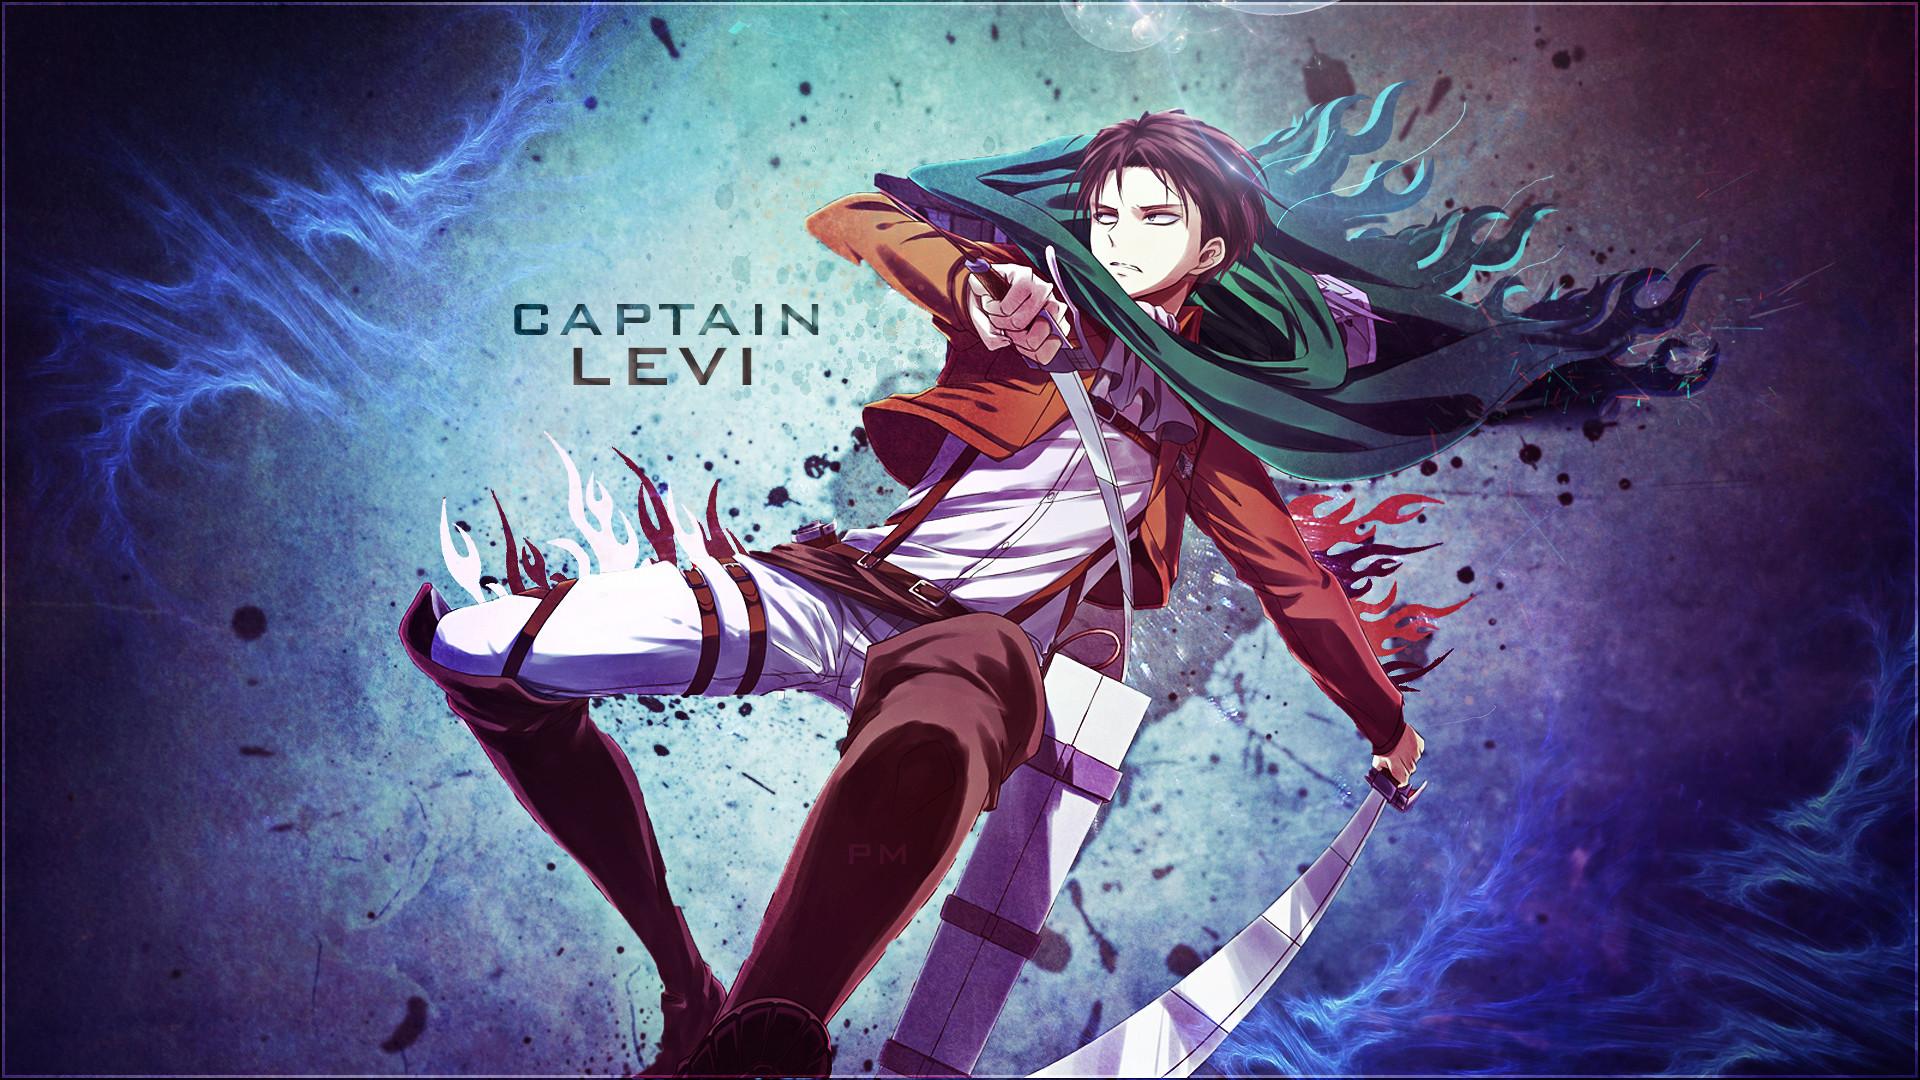 … [Wallpaper] – Captain Levi by attats